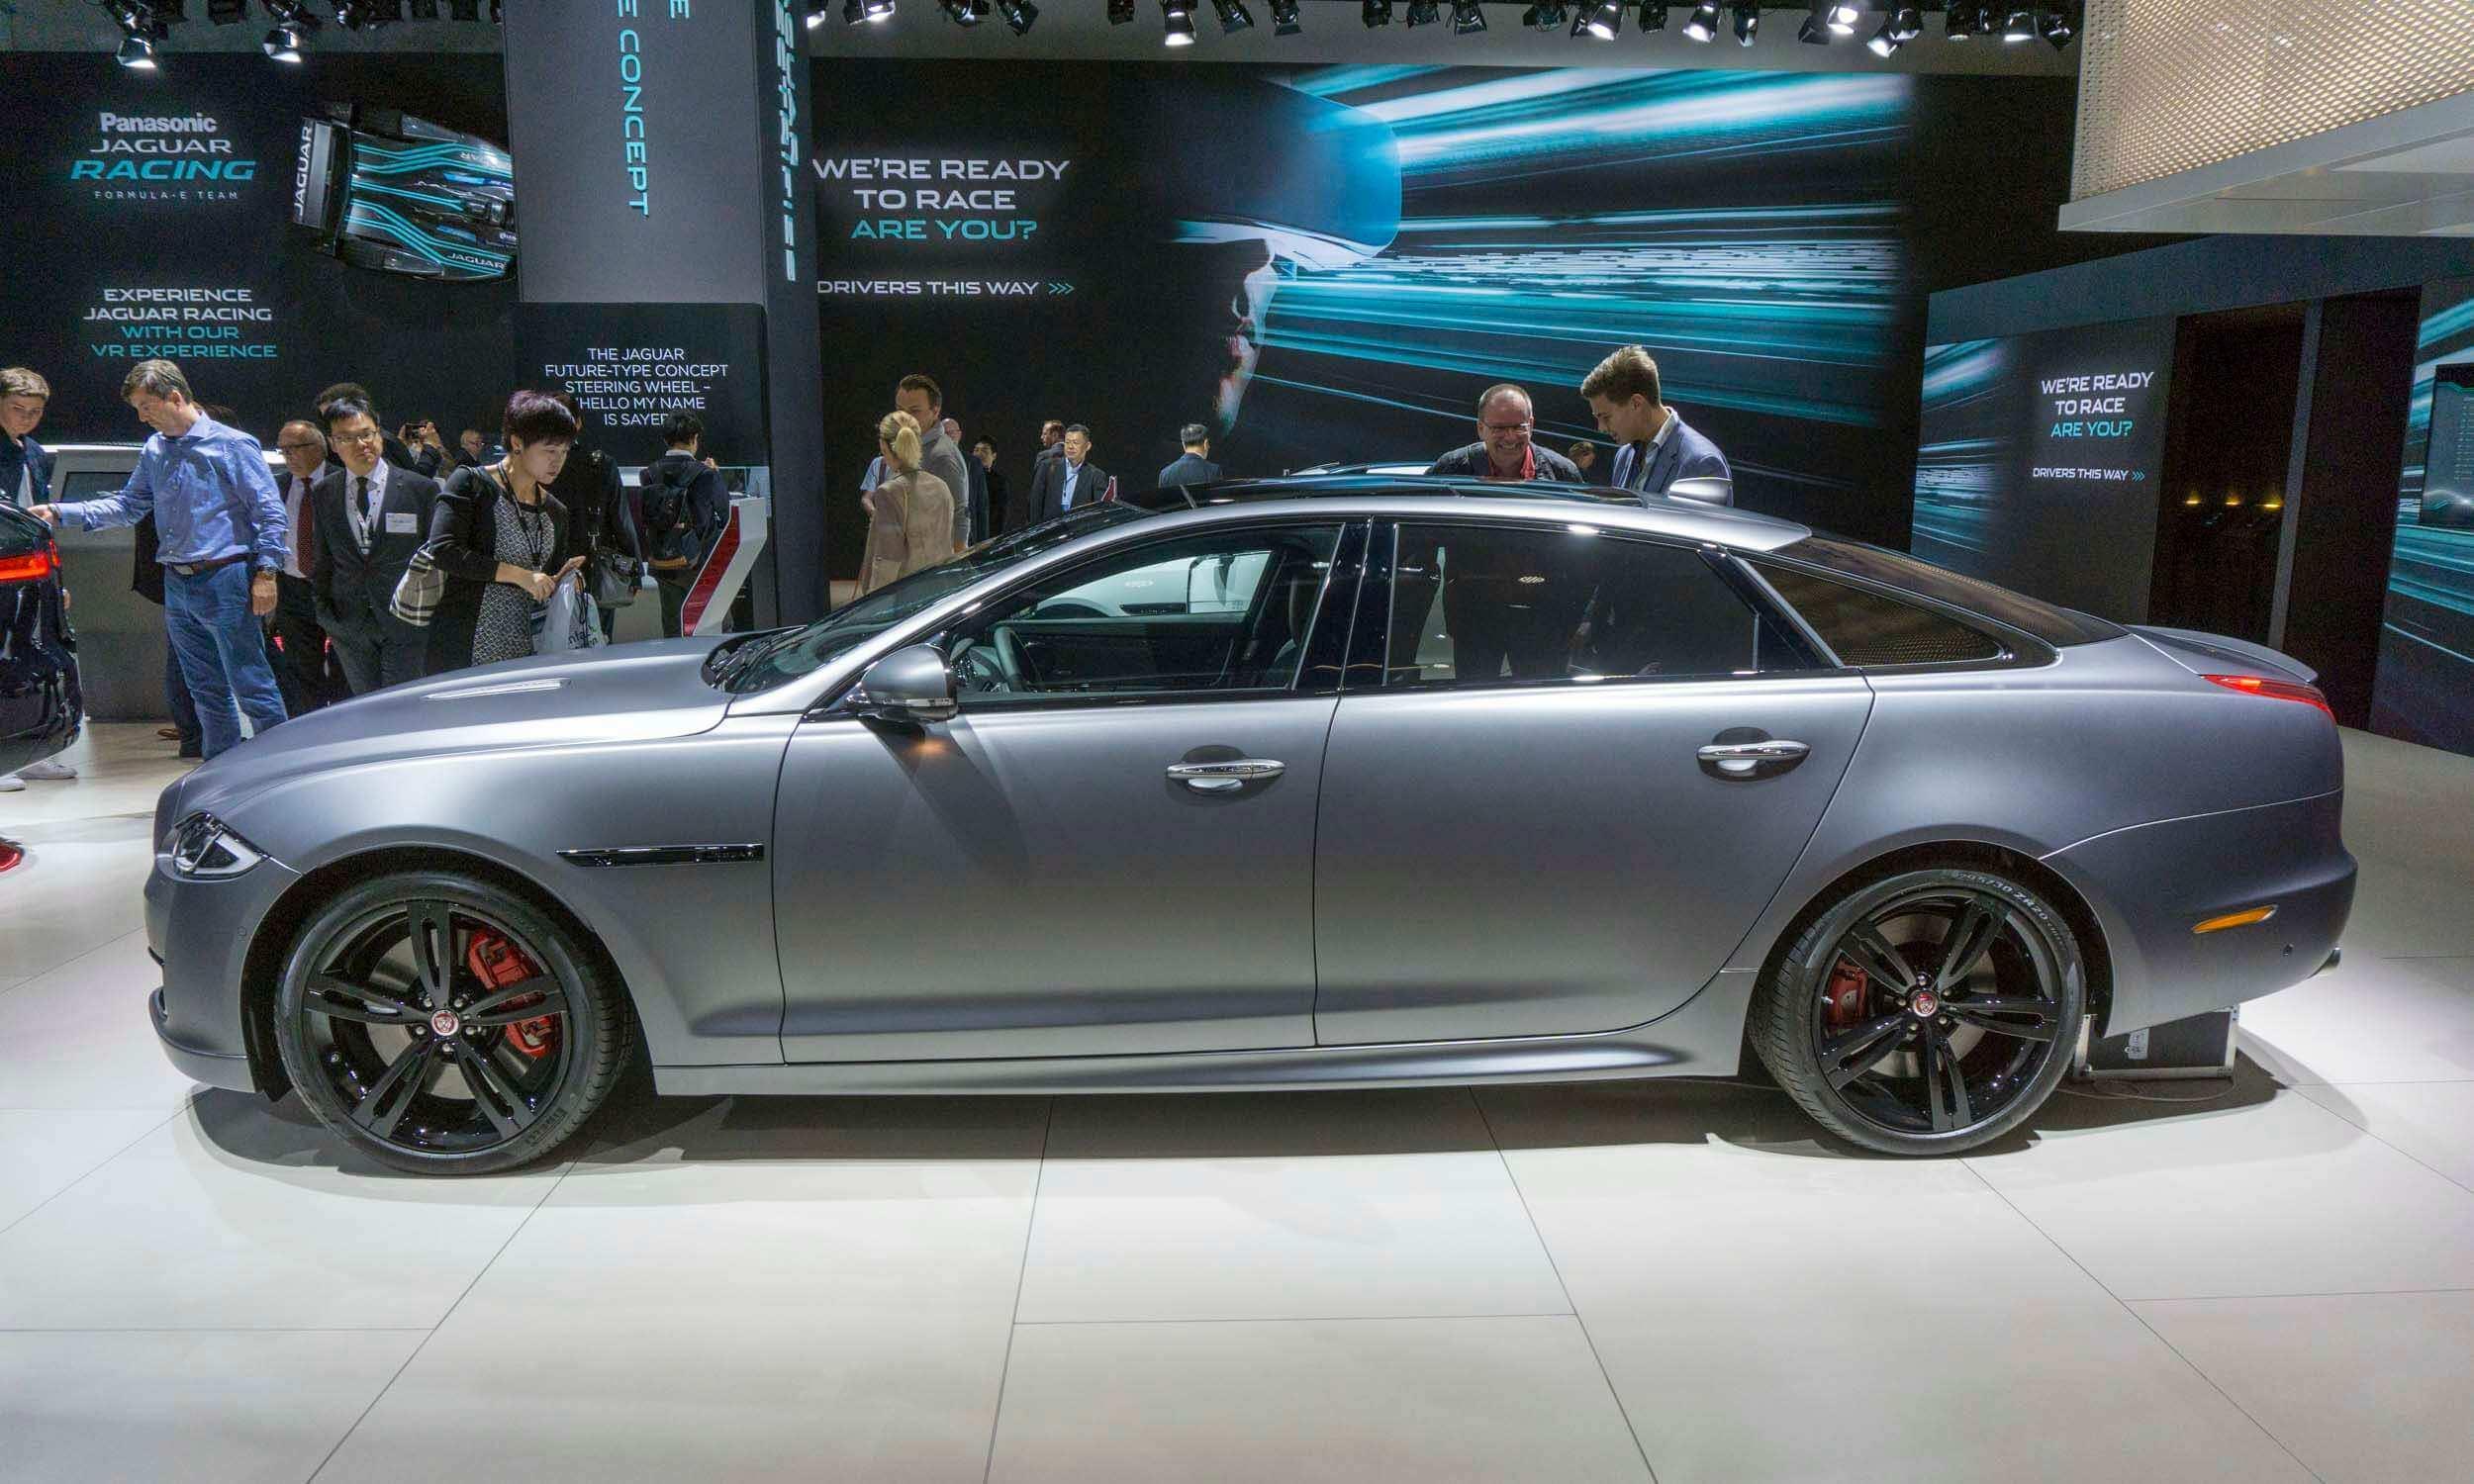 60 New 2019 Jaguar Xj Spy Images for 2019 Jaguar Xj Spy